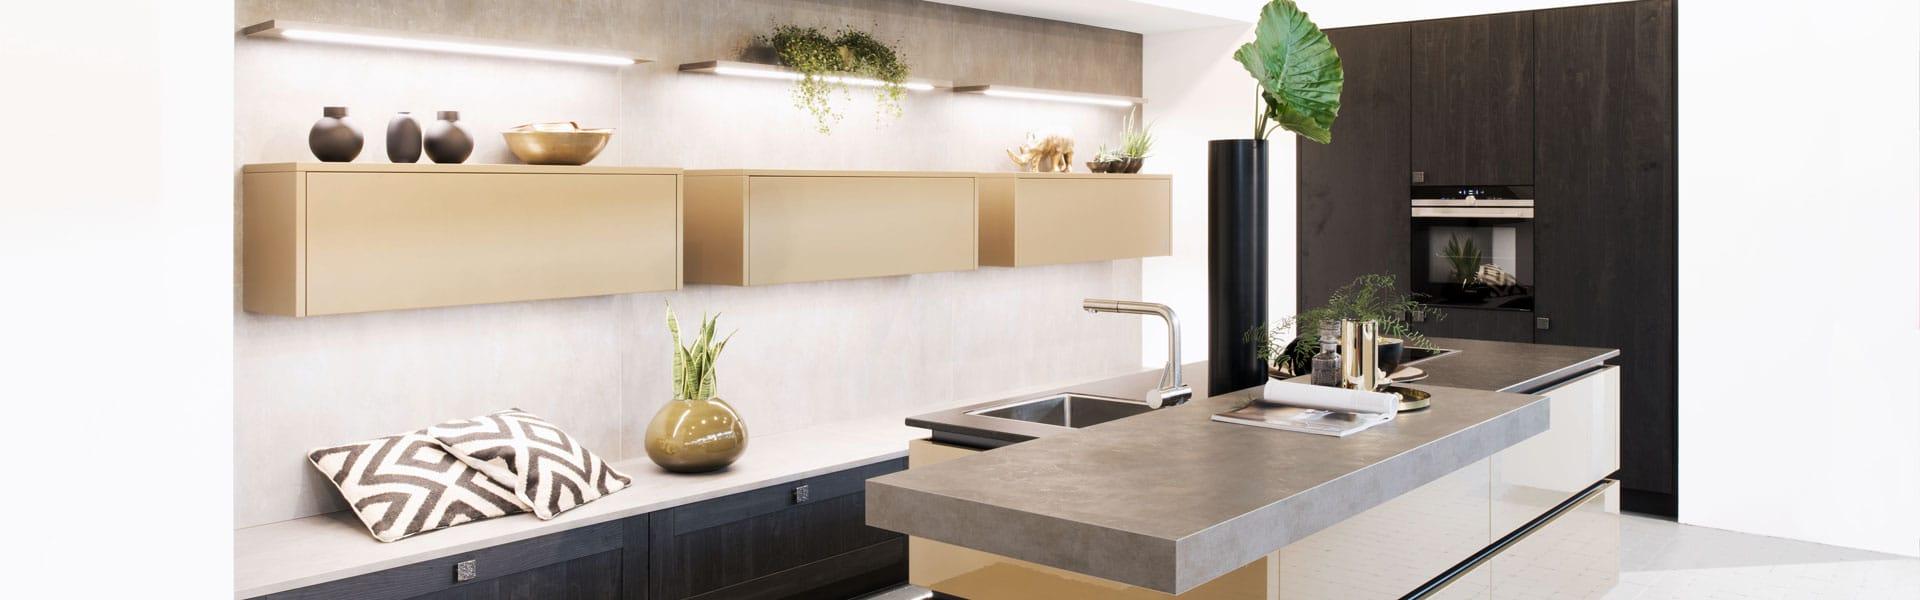 Duitse keukens kopen | Eigenhuis Keukens